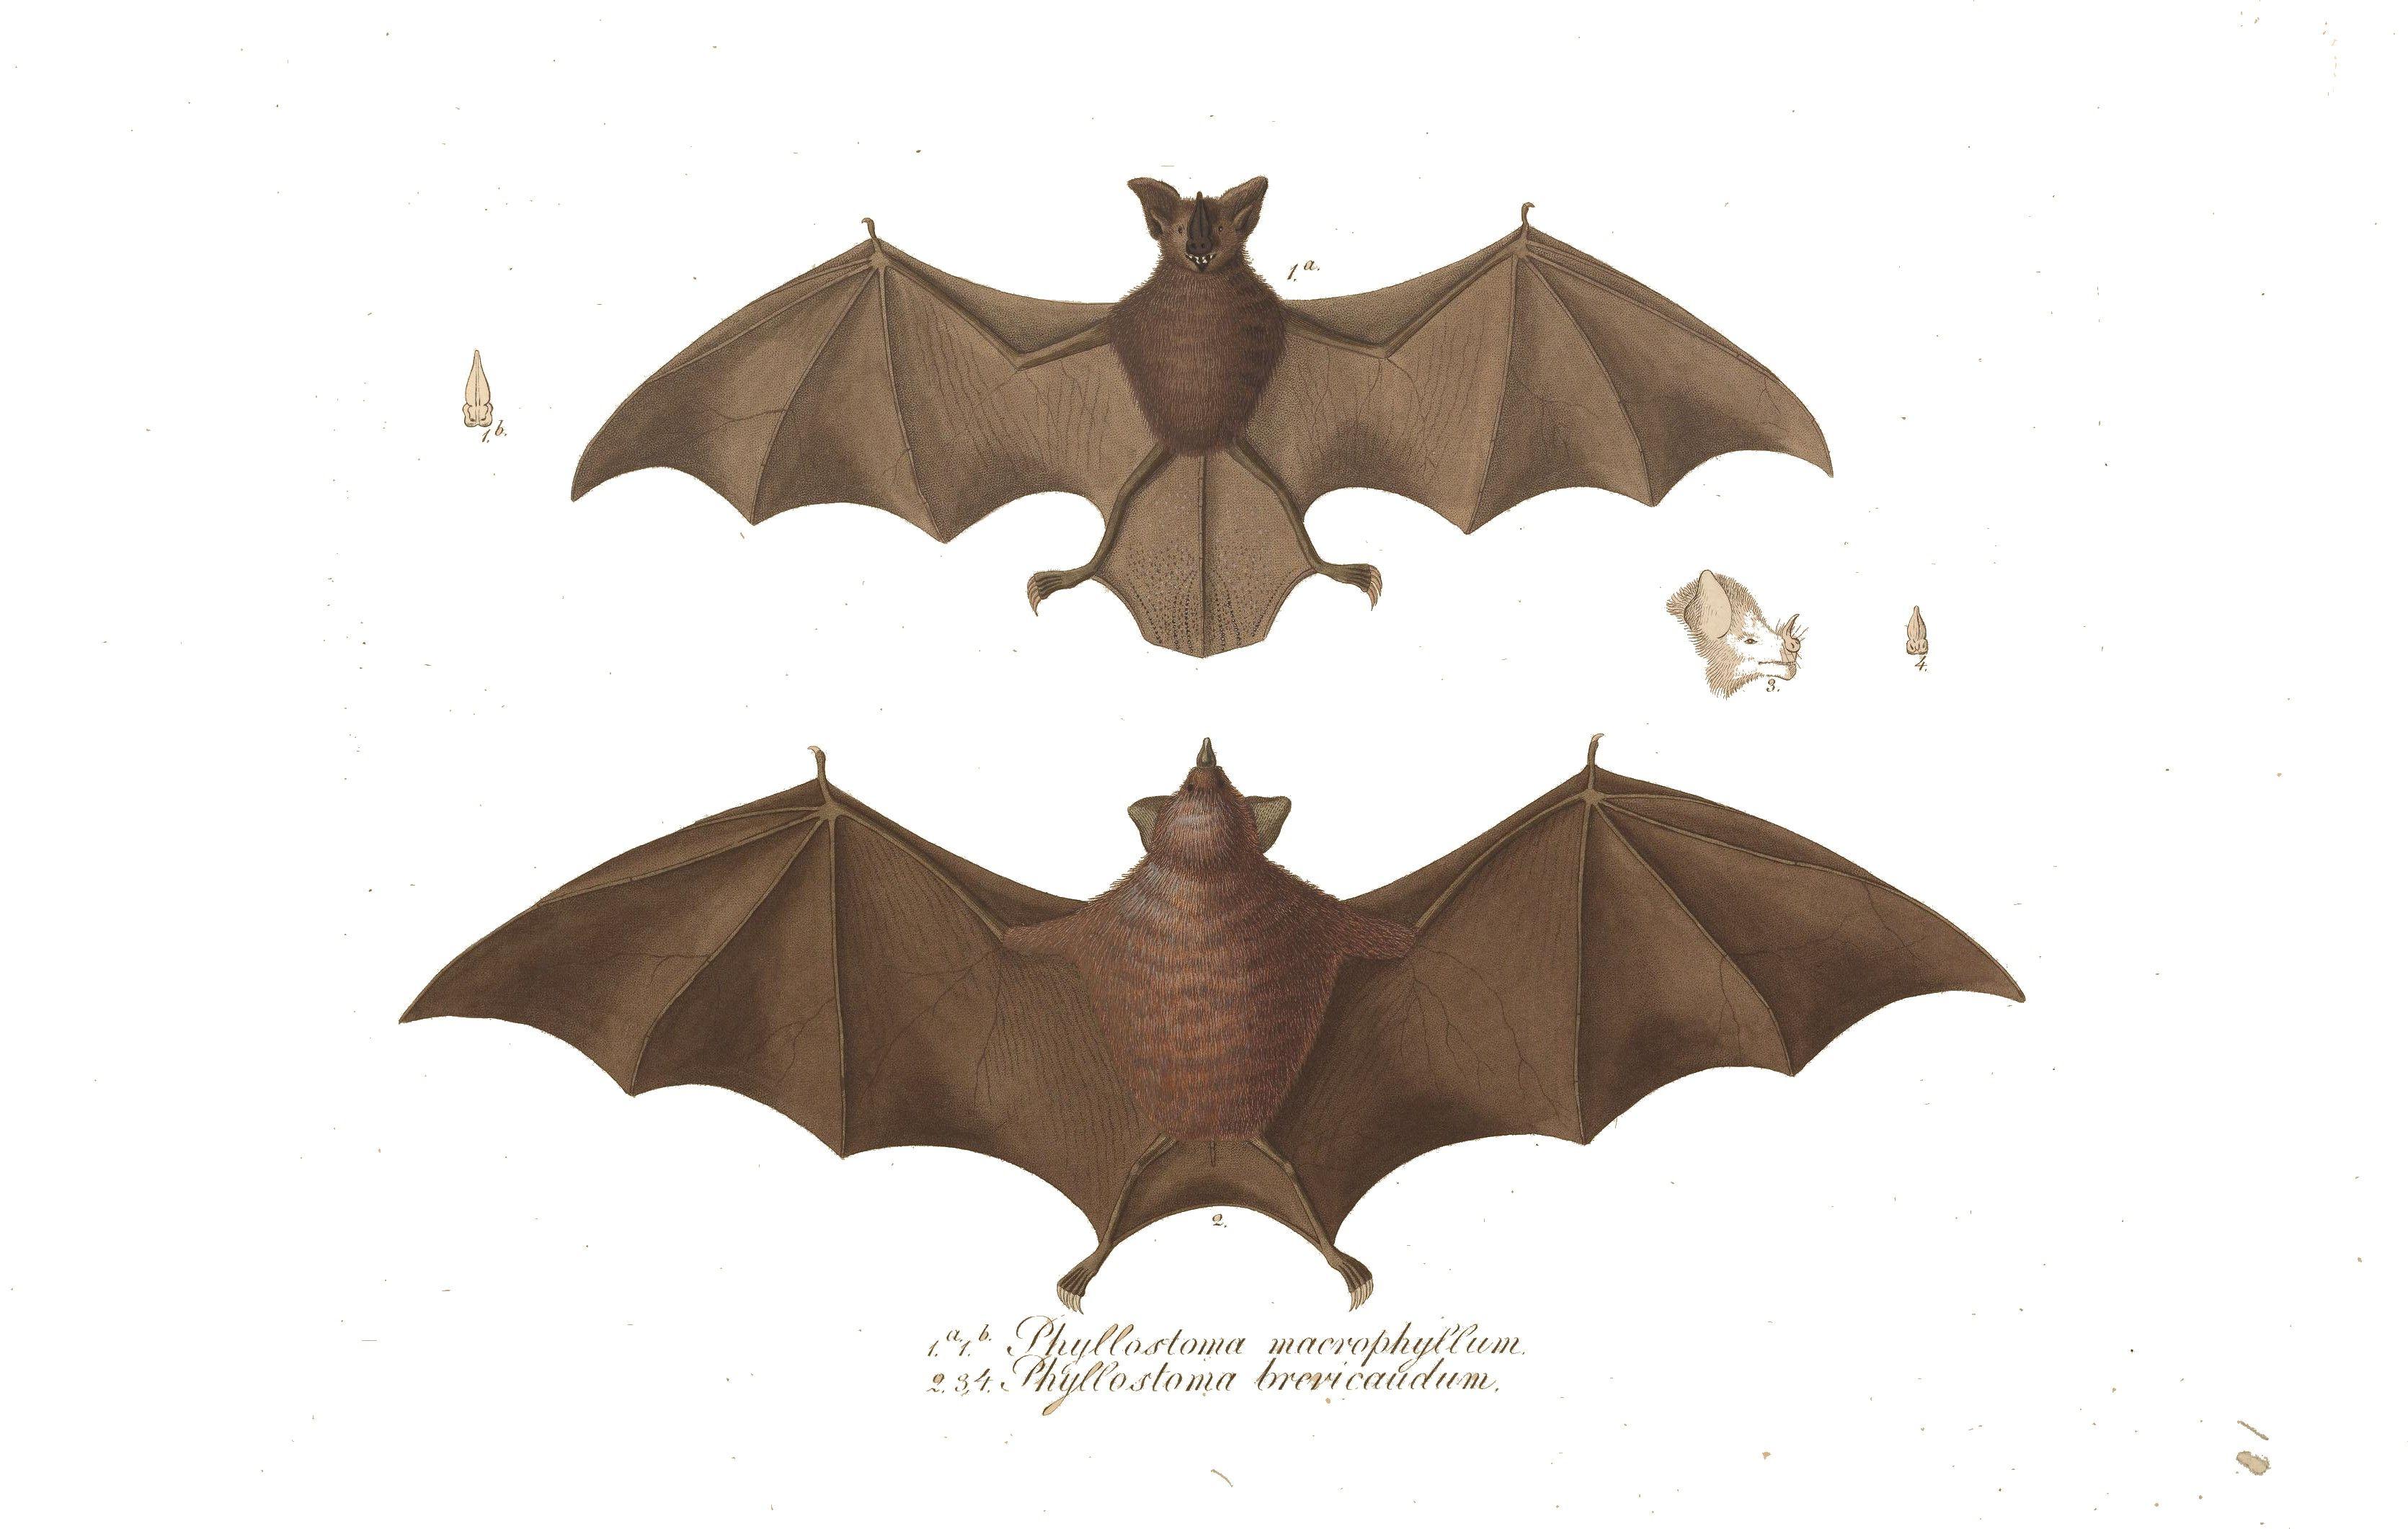 animal bat brasilian bat color drawing 3 - Bat Picture To Color